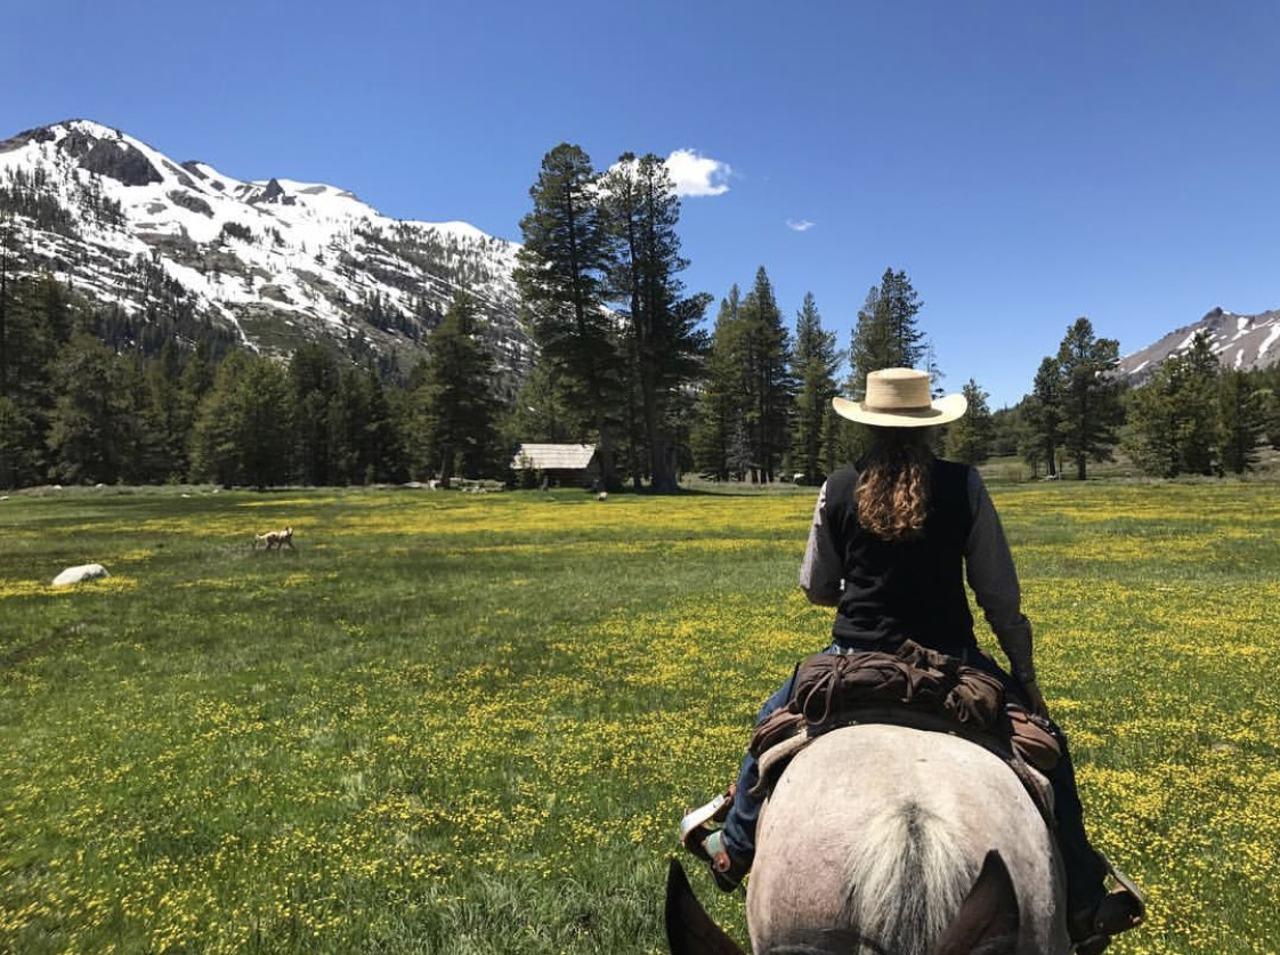 Kennedy Meadows horseback riding